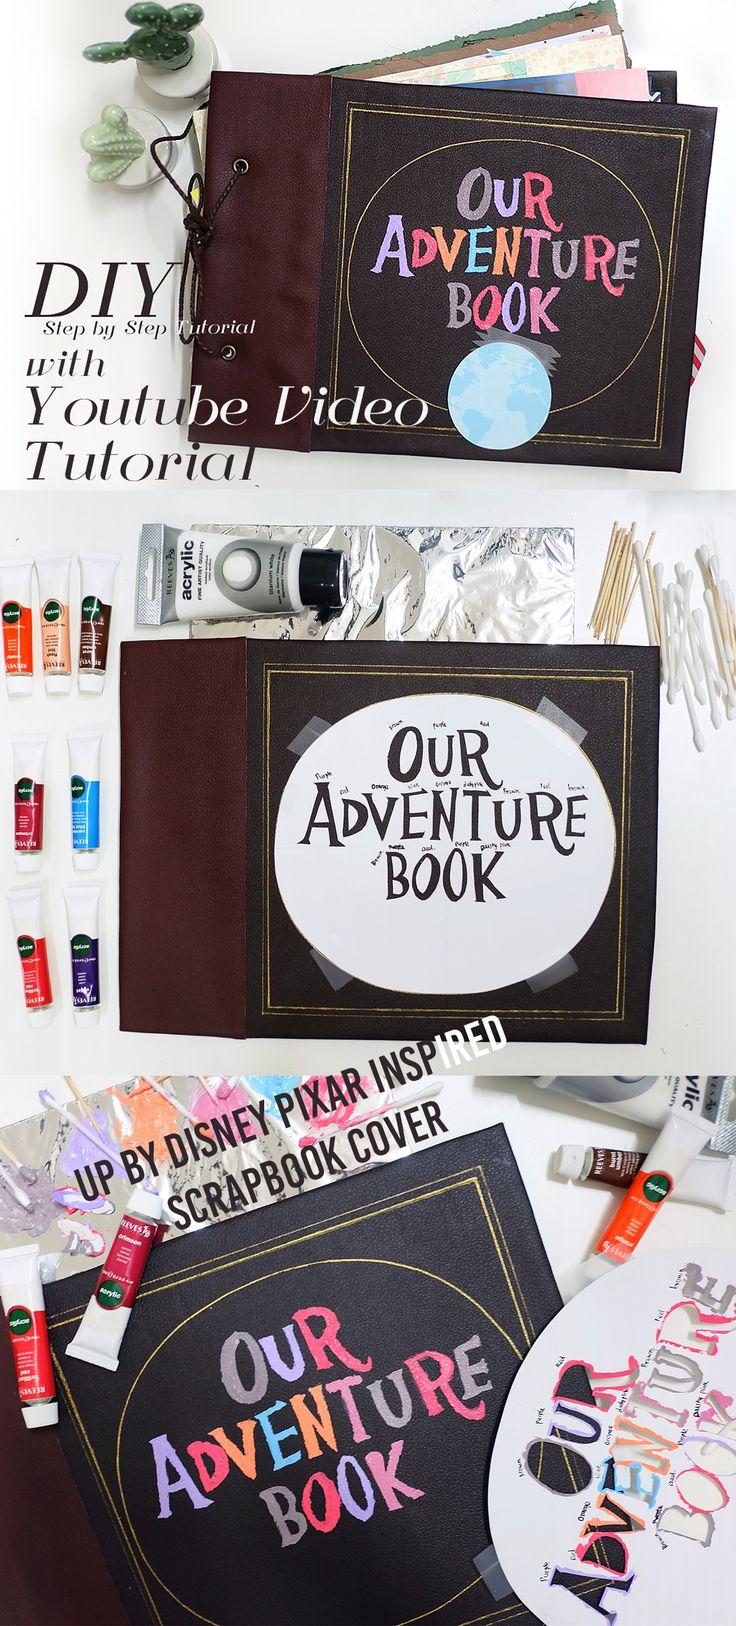 DIY up disney pixar scrapbook journal my adventure book tutorial with youtube video step  by step tutorial